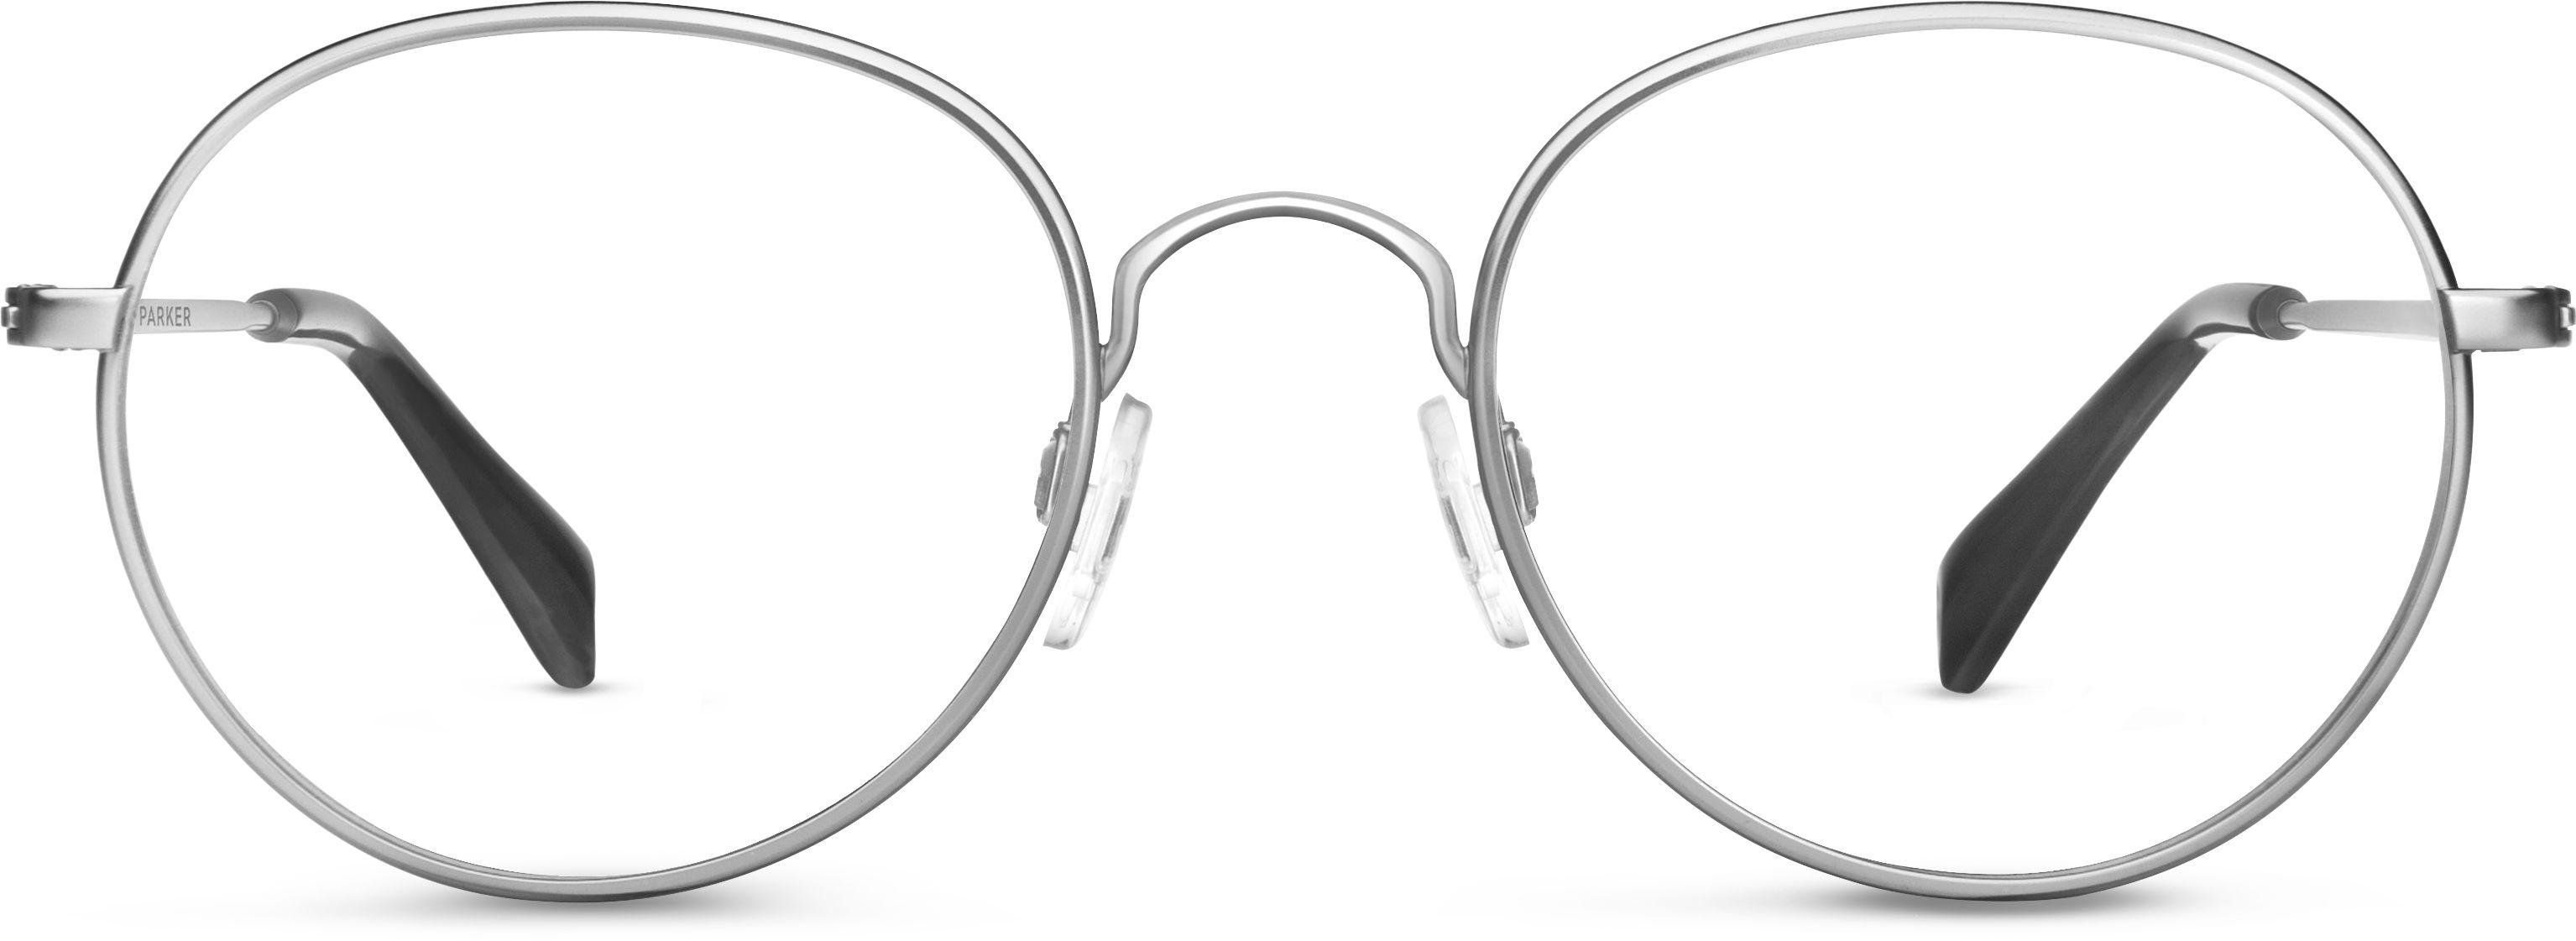 Abbott Eyeglasses in Jet Silver for Men   Warby Parker